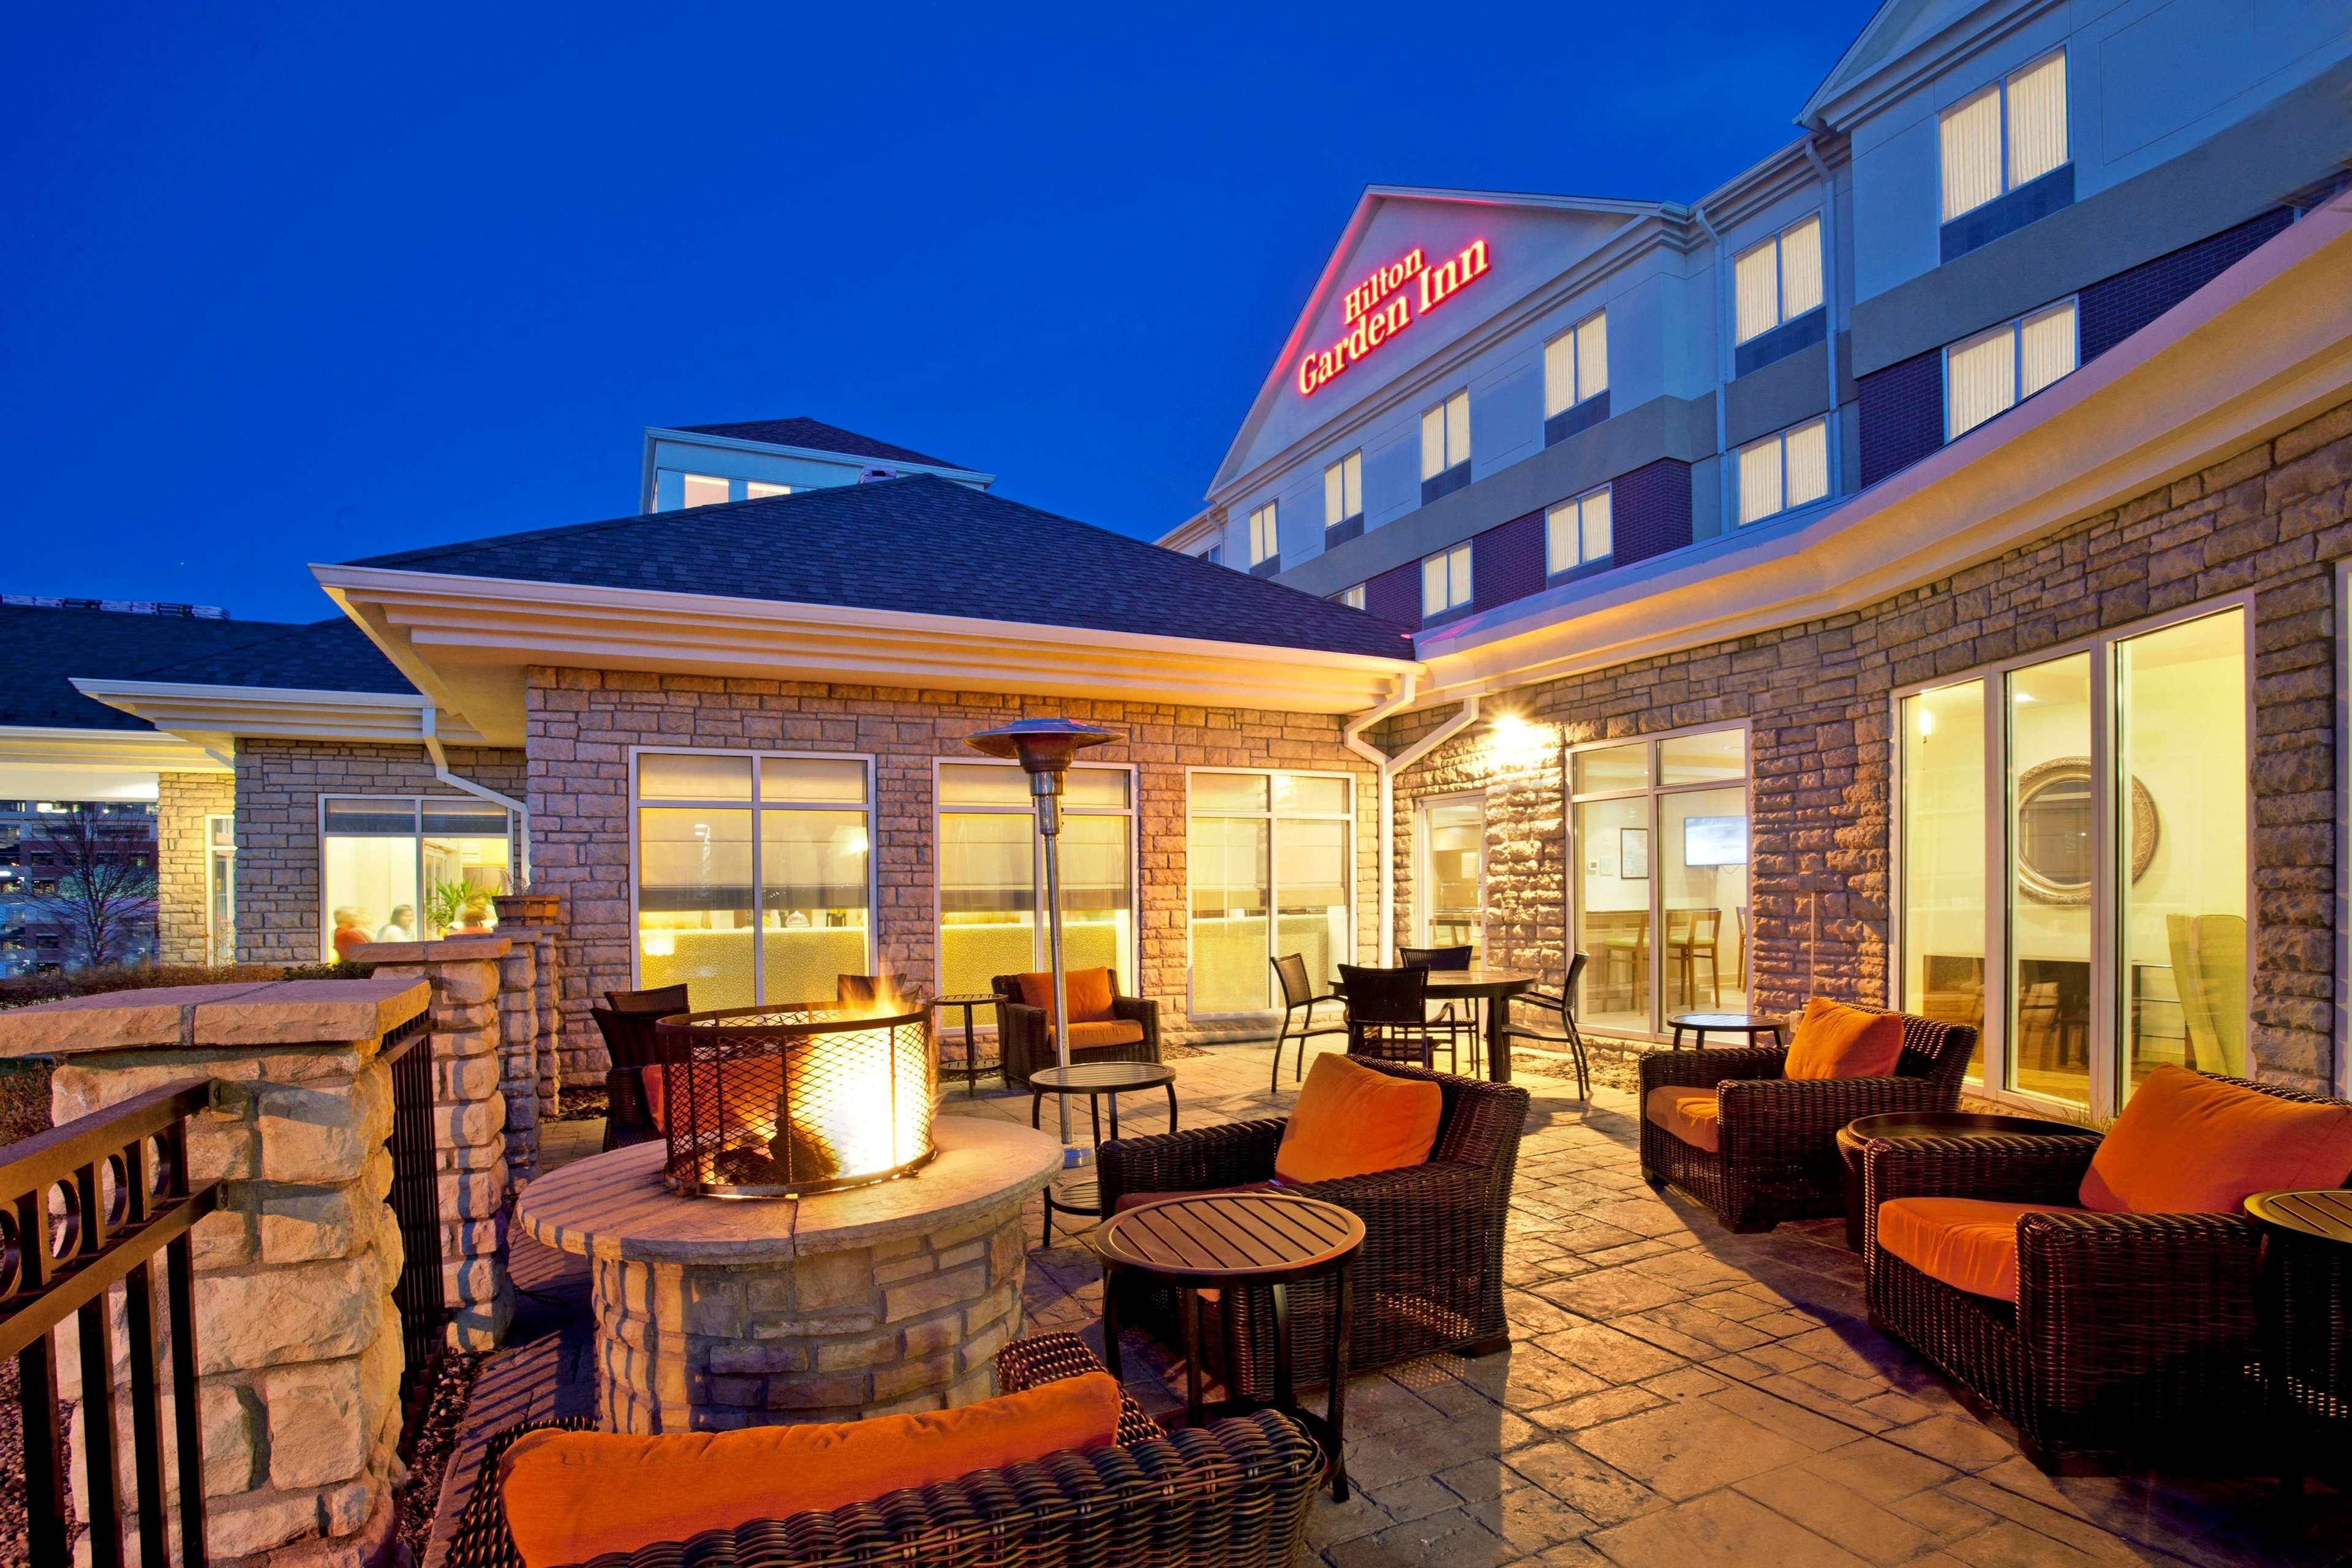 Hilton Garden Inn Fort Collins image 35